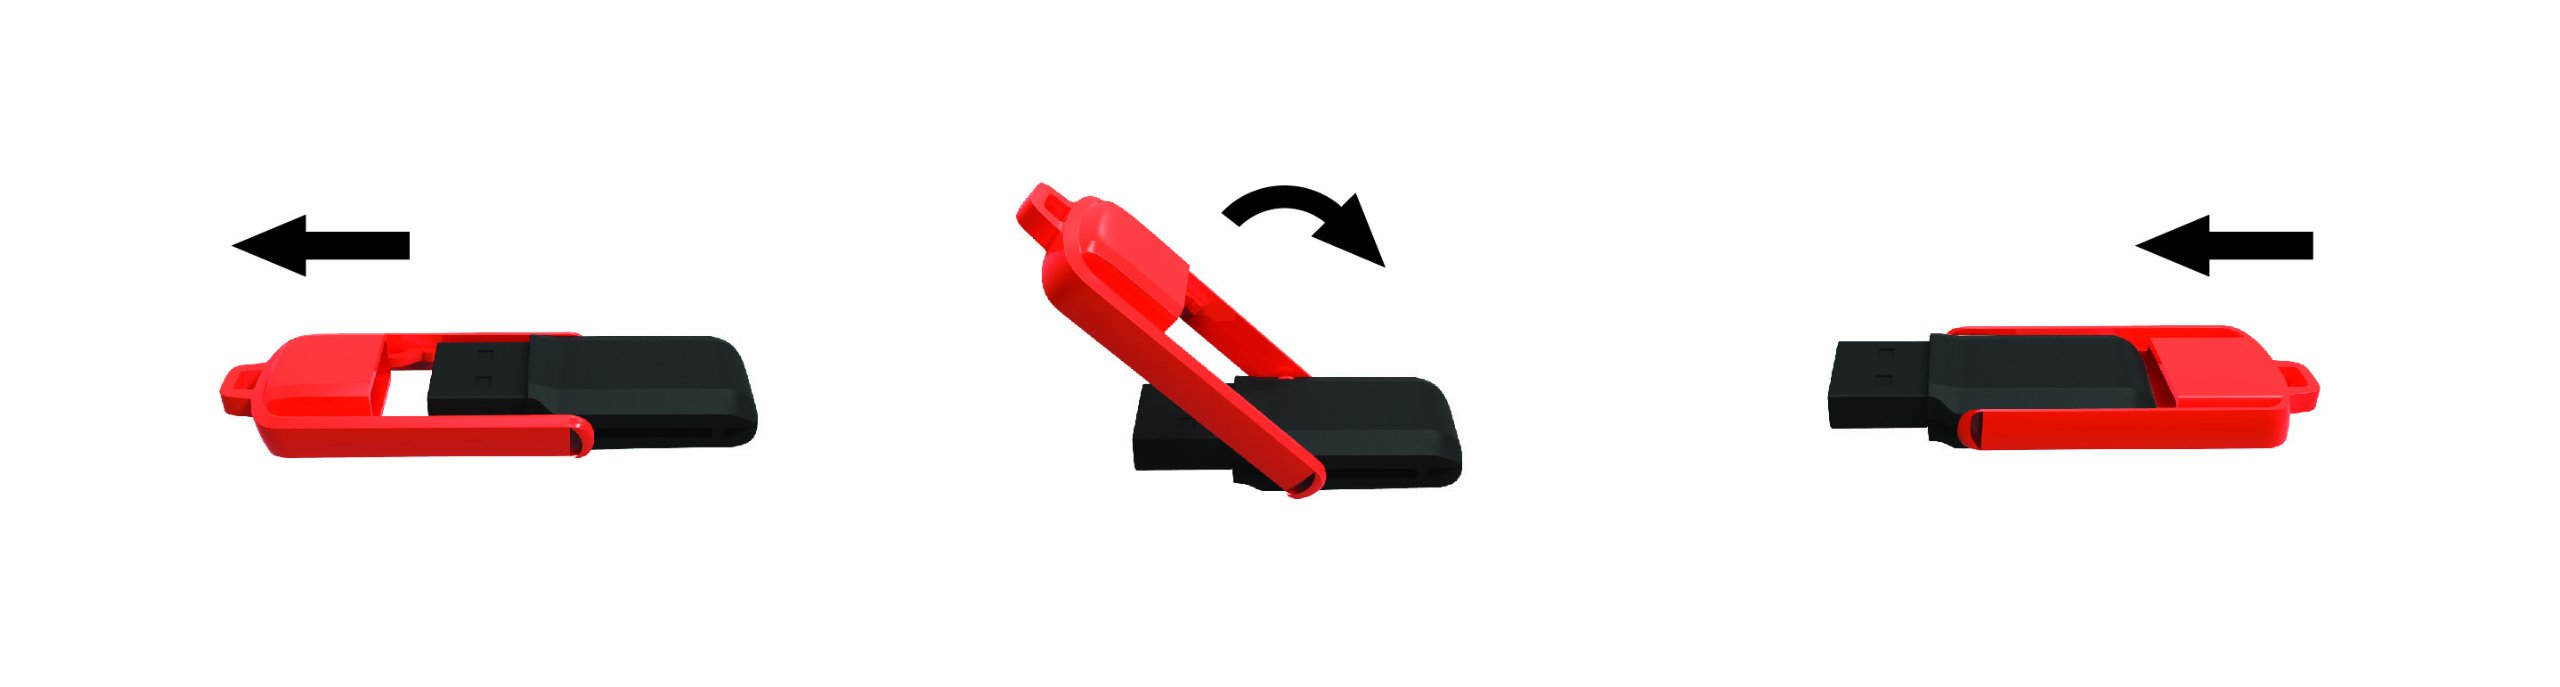 Sandisk Cruzer Switch Cz52 16gb Usb 20 Flash Drive Sdcz52 016g Flashdisk Blade B35